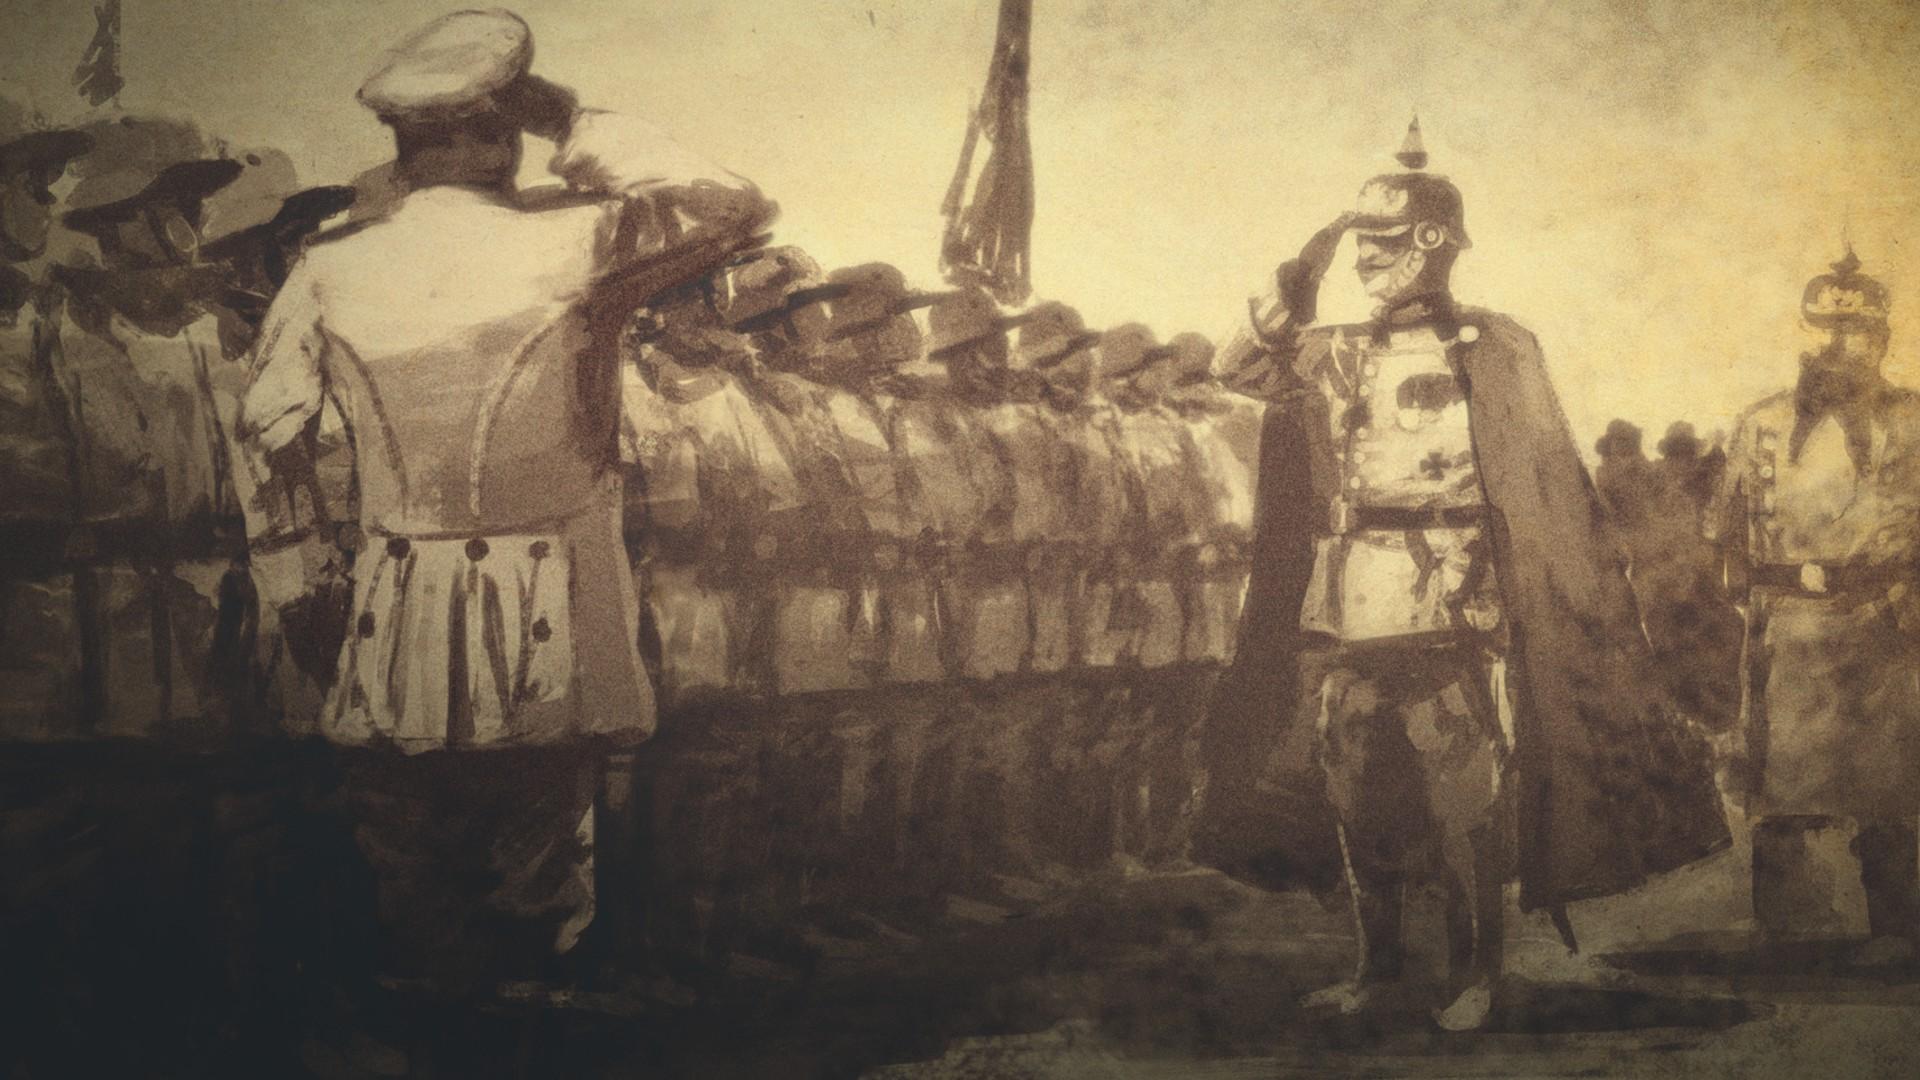 Sniper Elite 3 Wallpaper: Sniper Elite III By Arminius1871 On DeviantArt